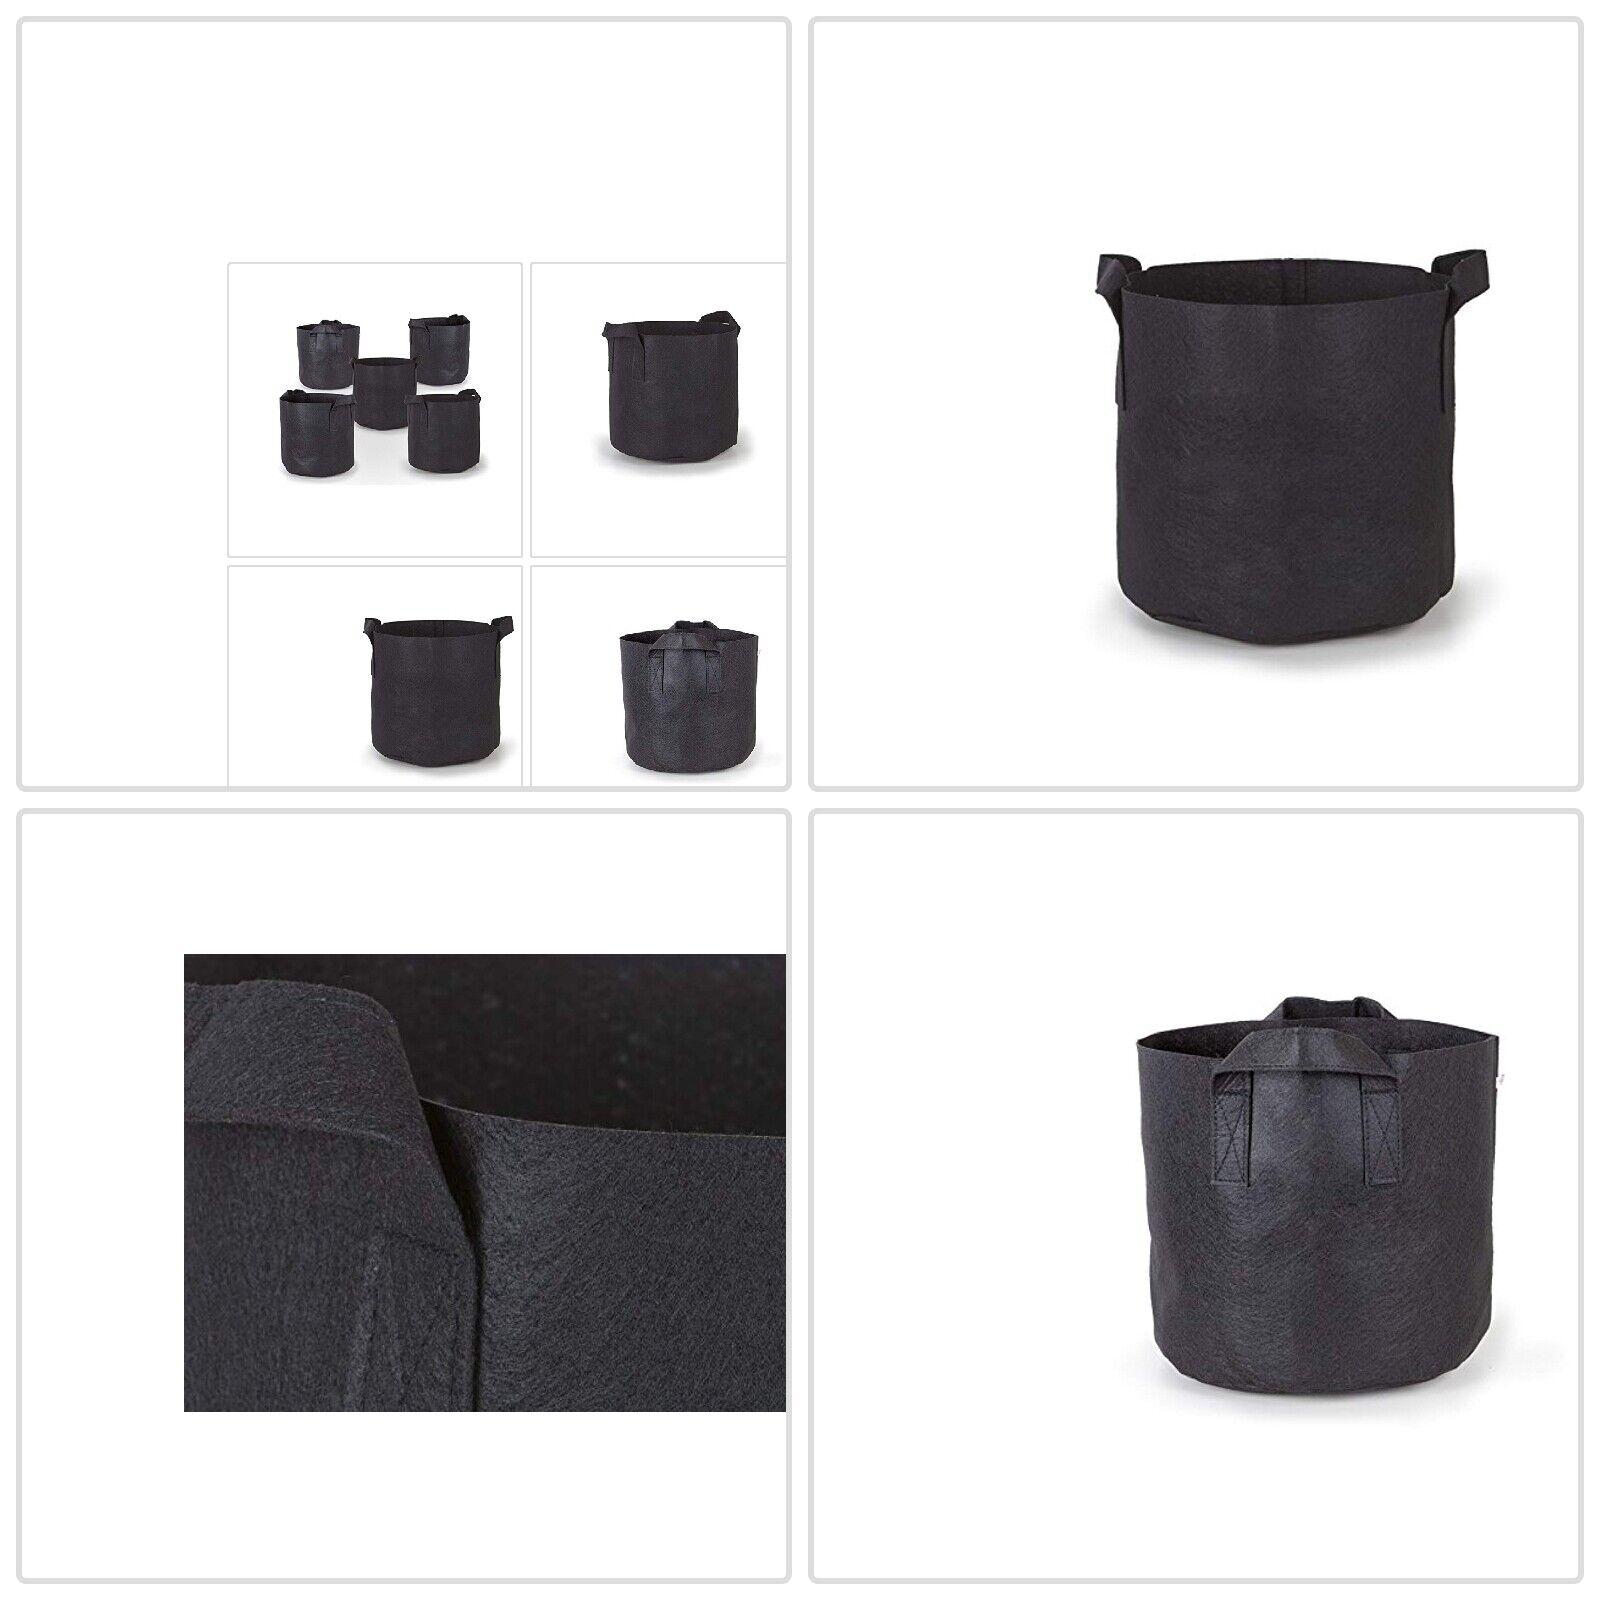 247Garden 5-Pack 7 Gallon Grow Bags/Aeration Fabric Pots w/H